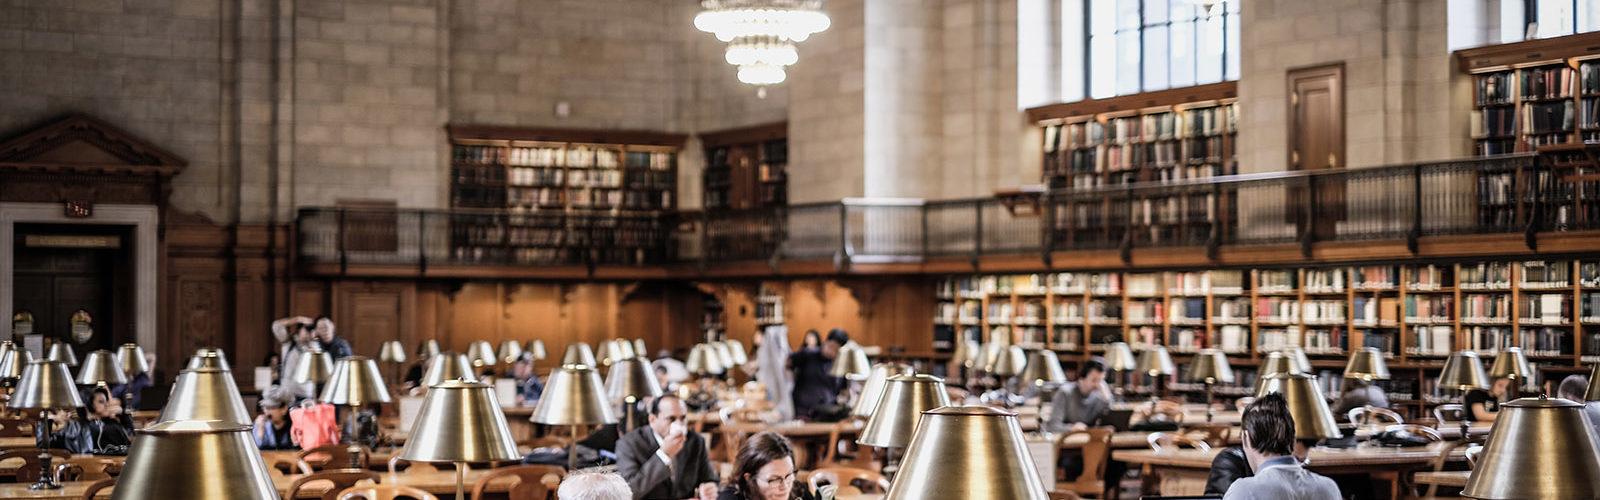 new-york-libruary